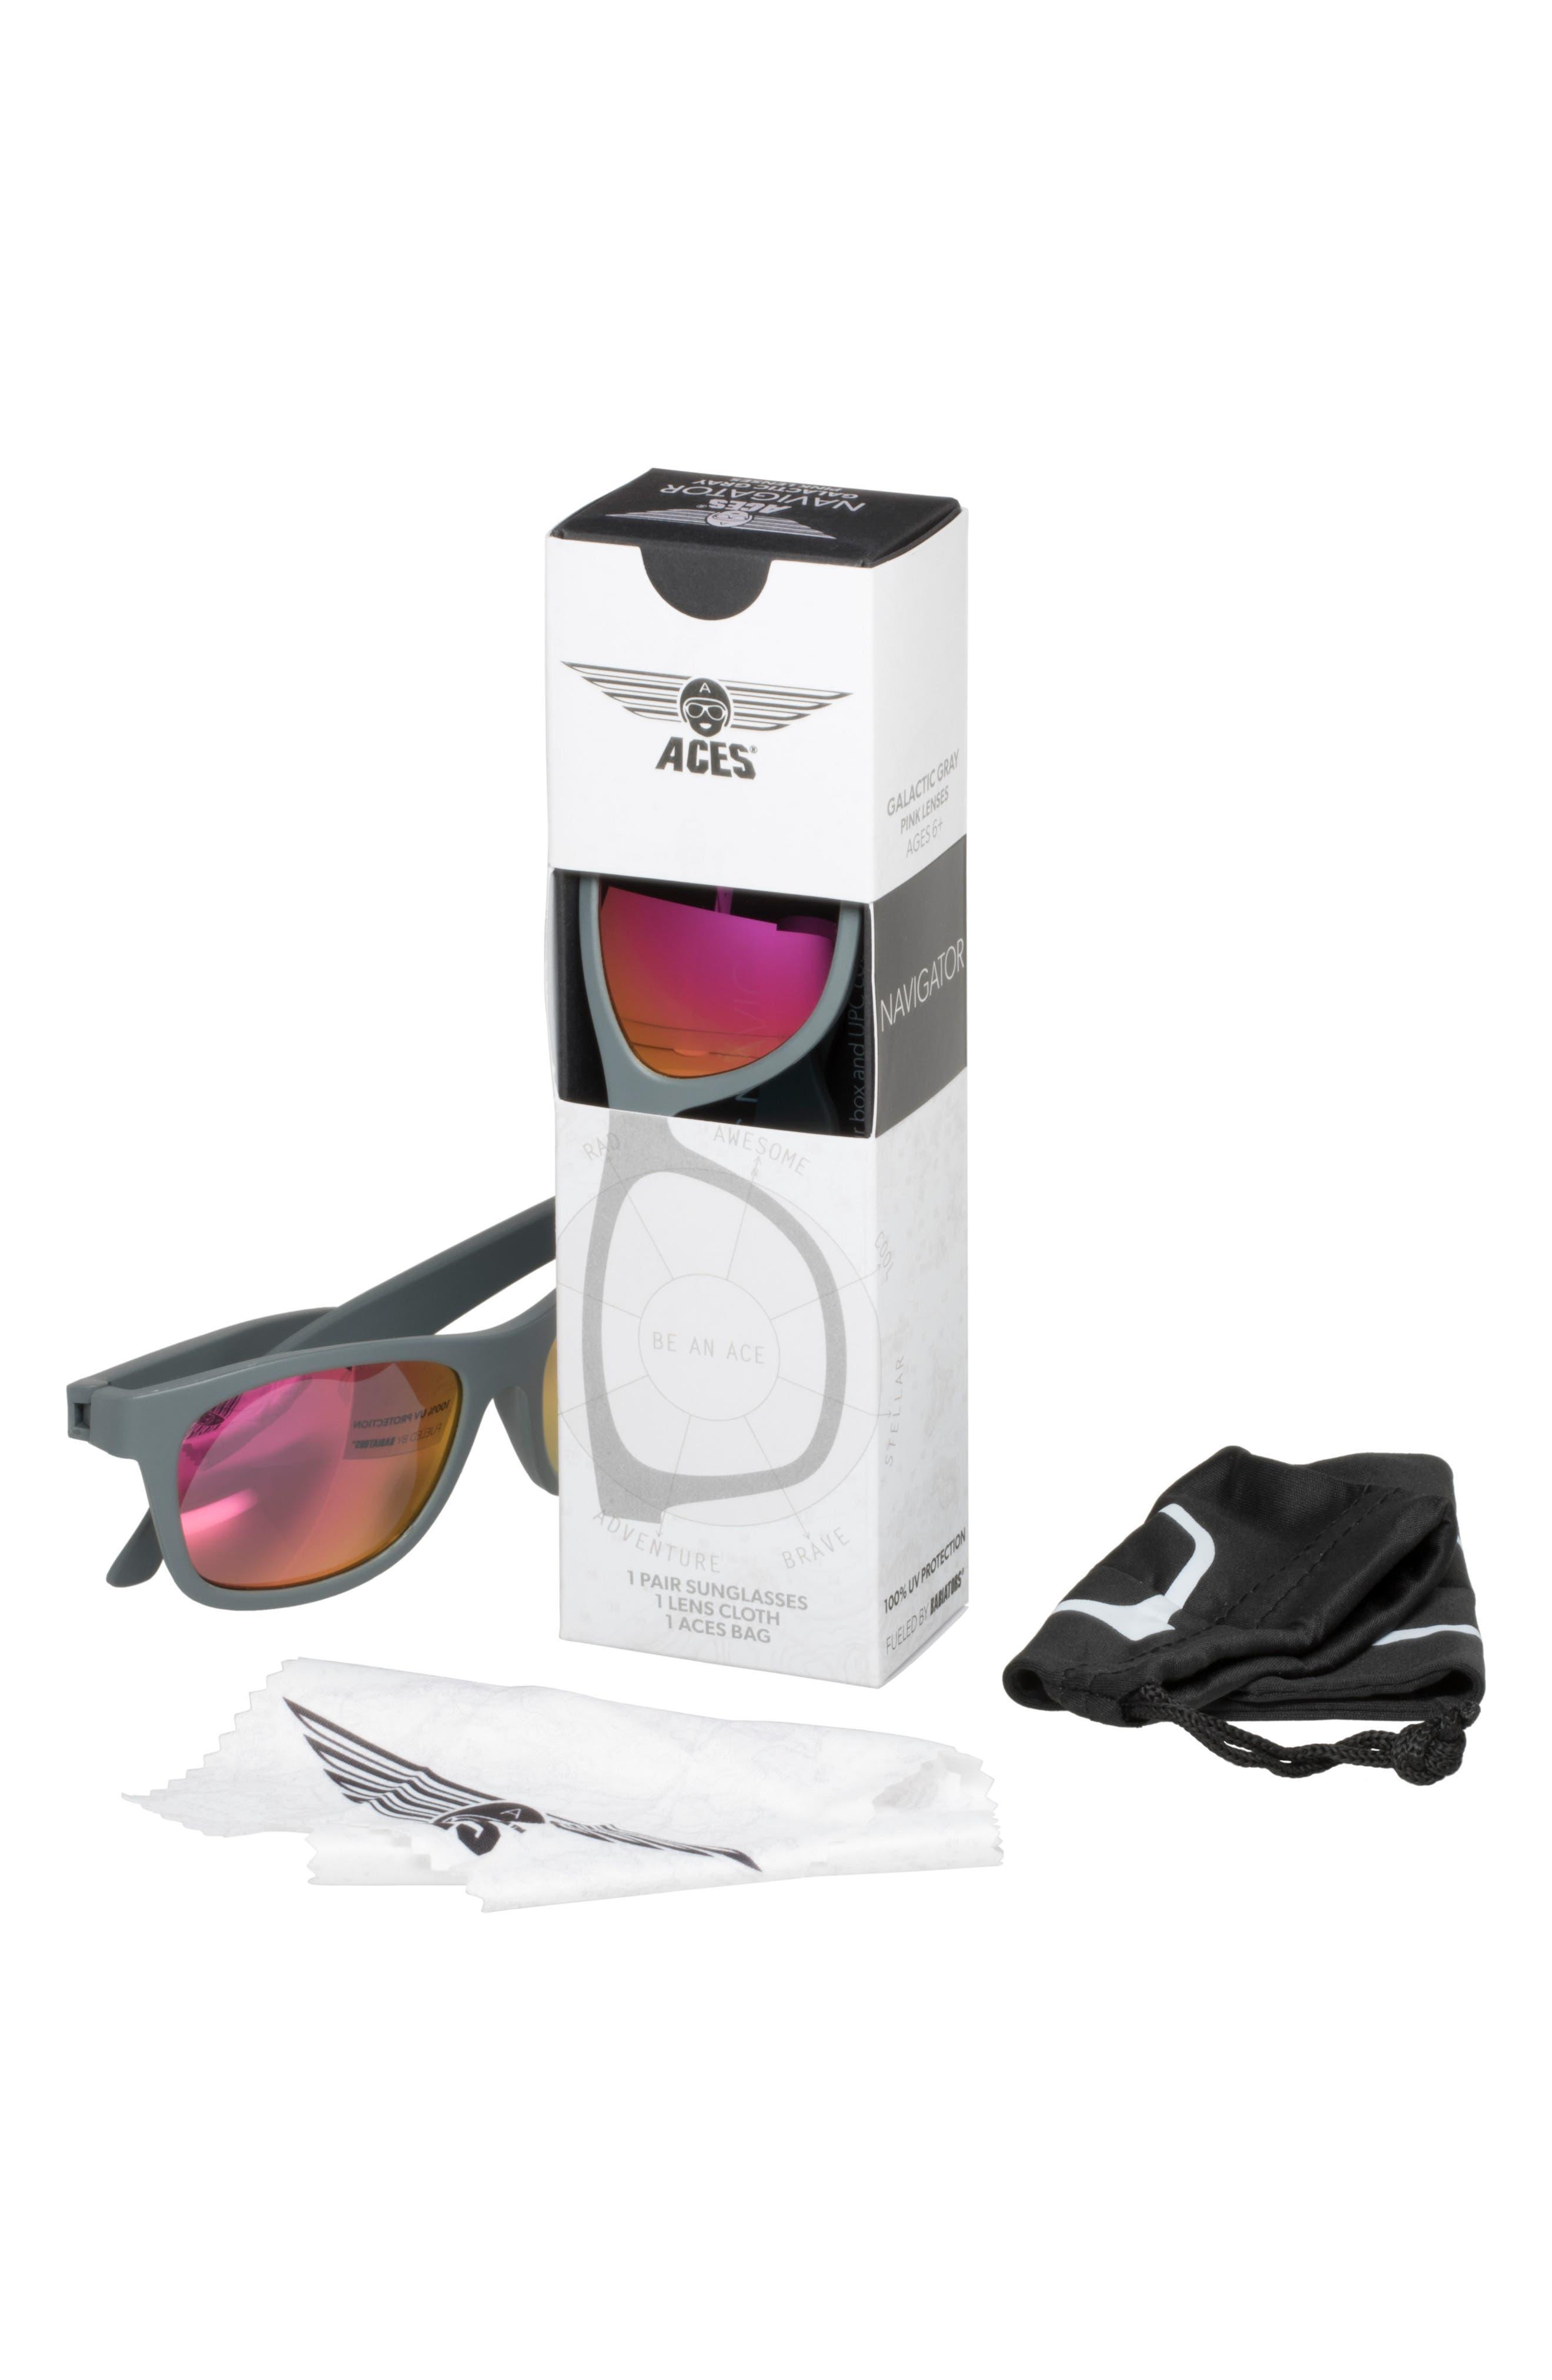 Aces Navigator Sunglasses,                             Alternate thumbnail 2, color,                             020